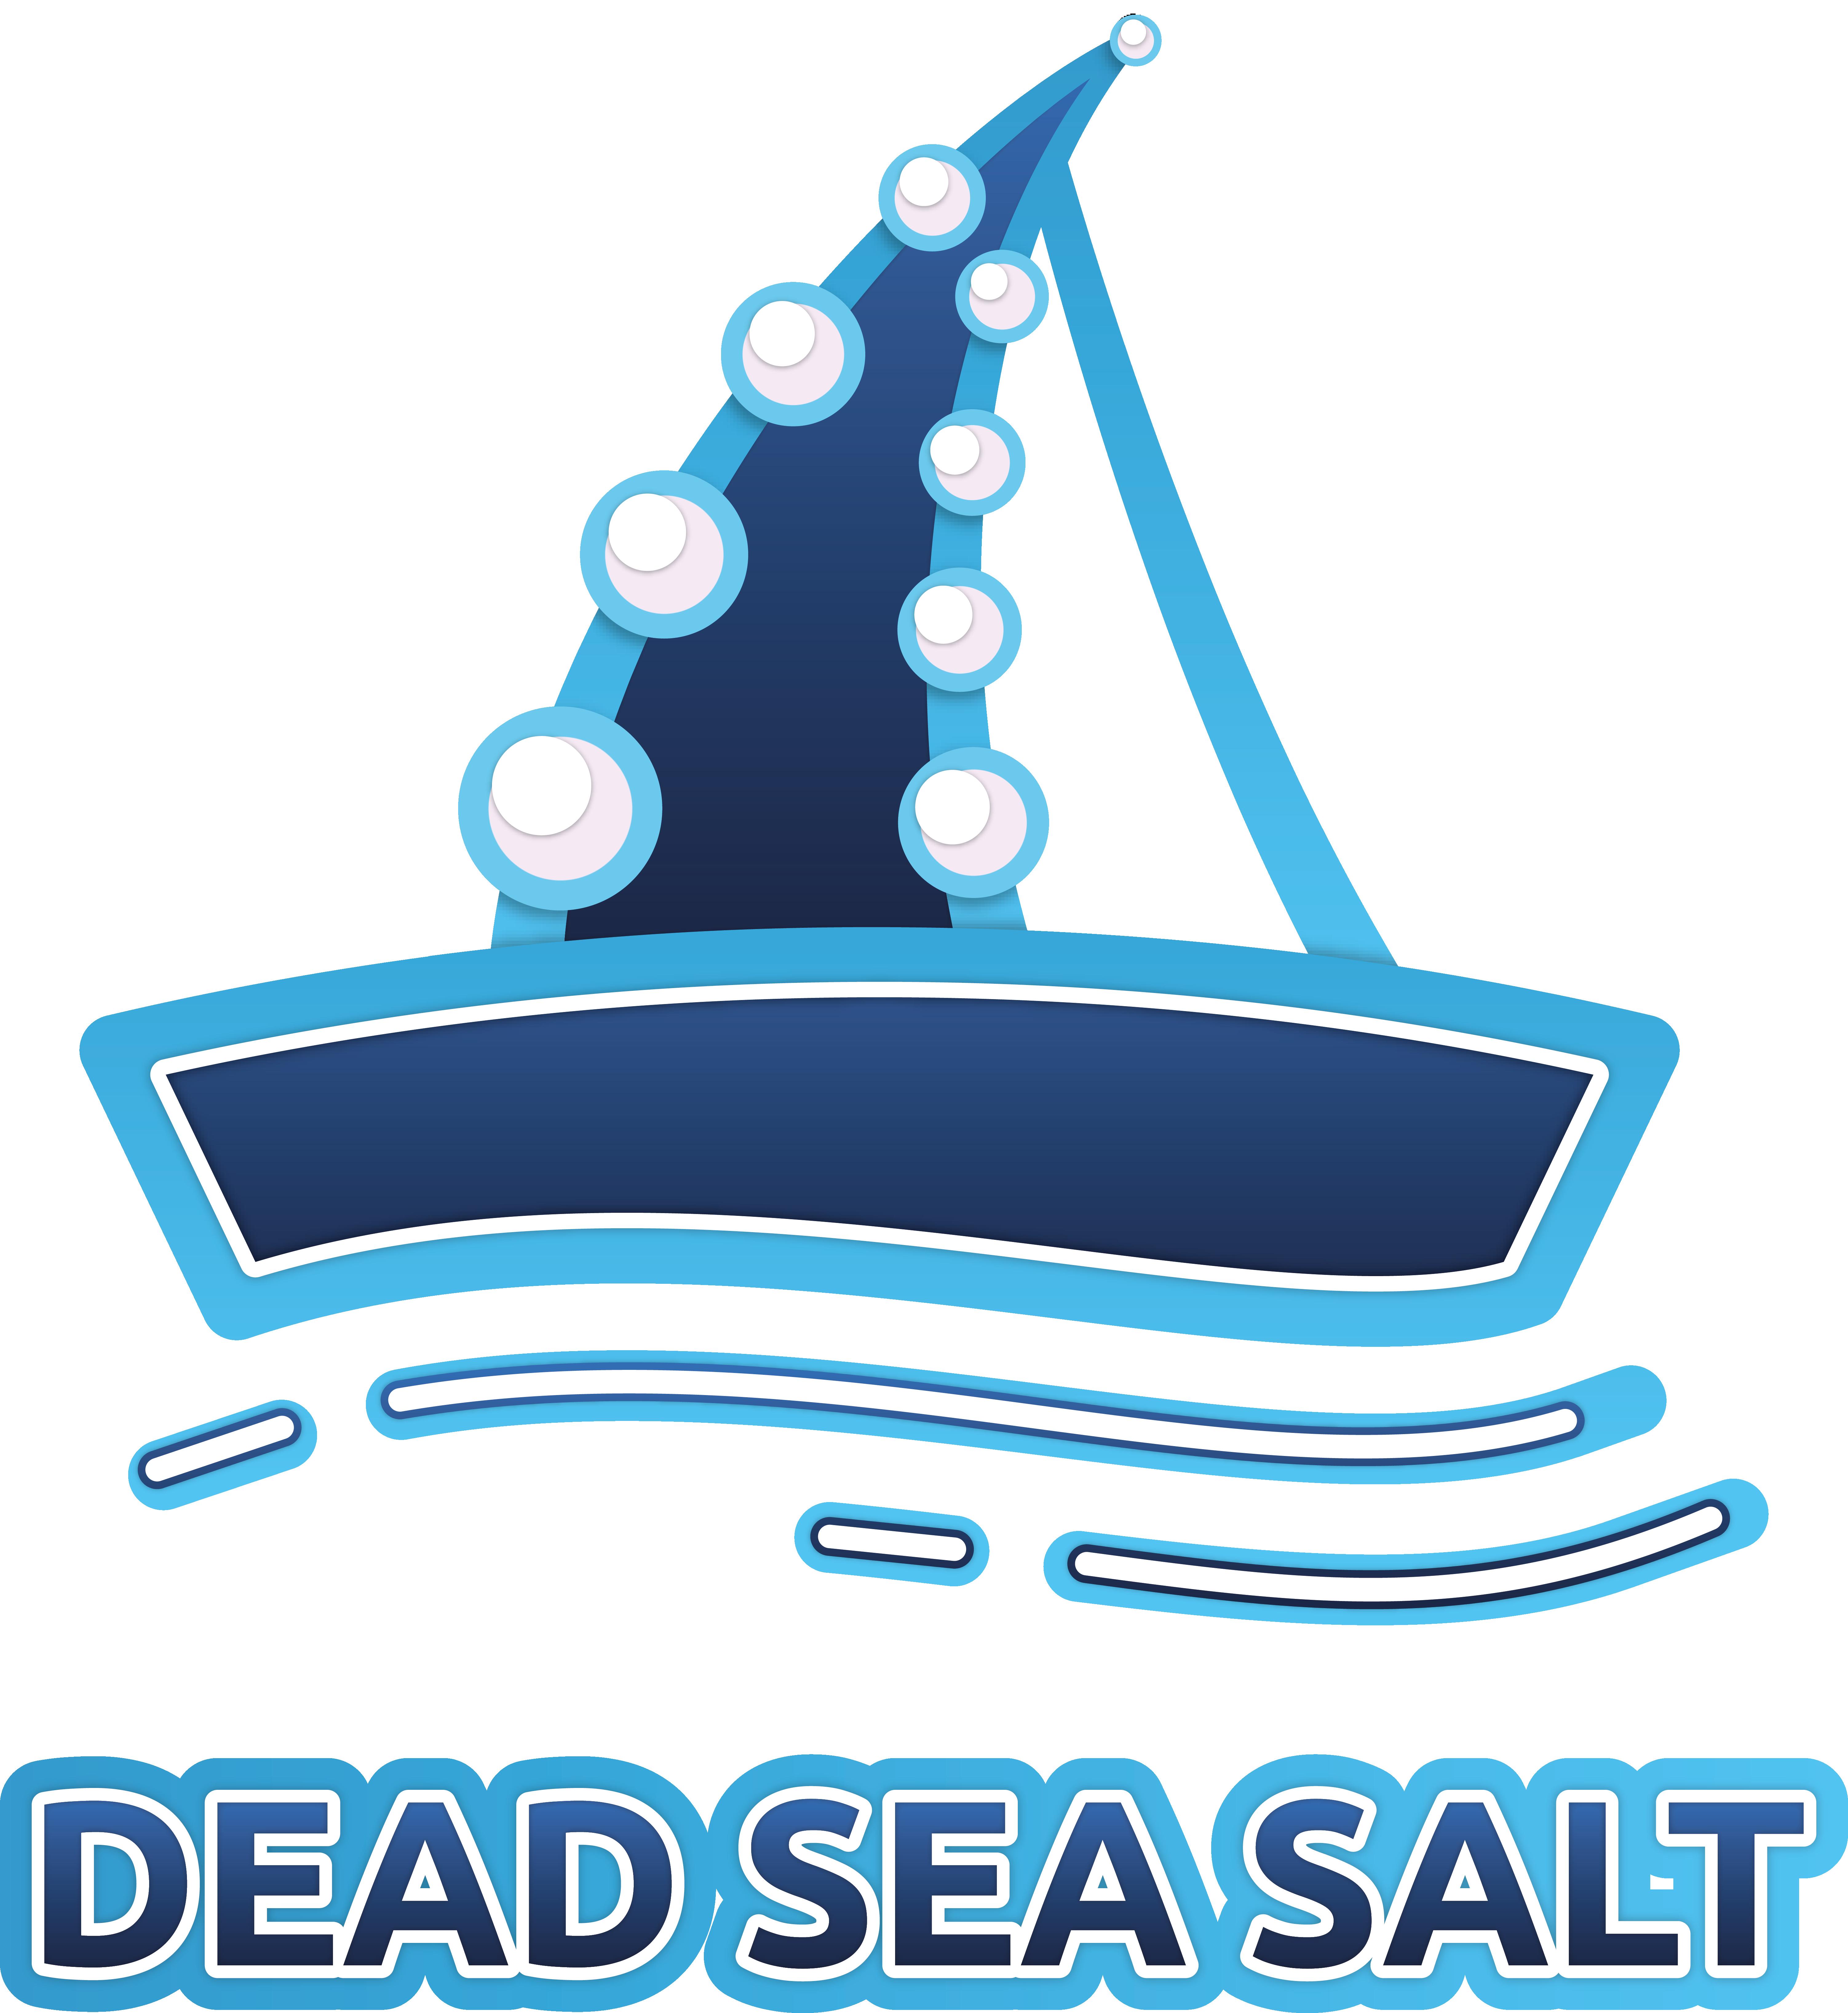 deadseasalt logo